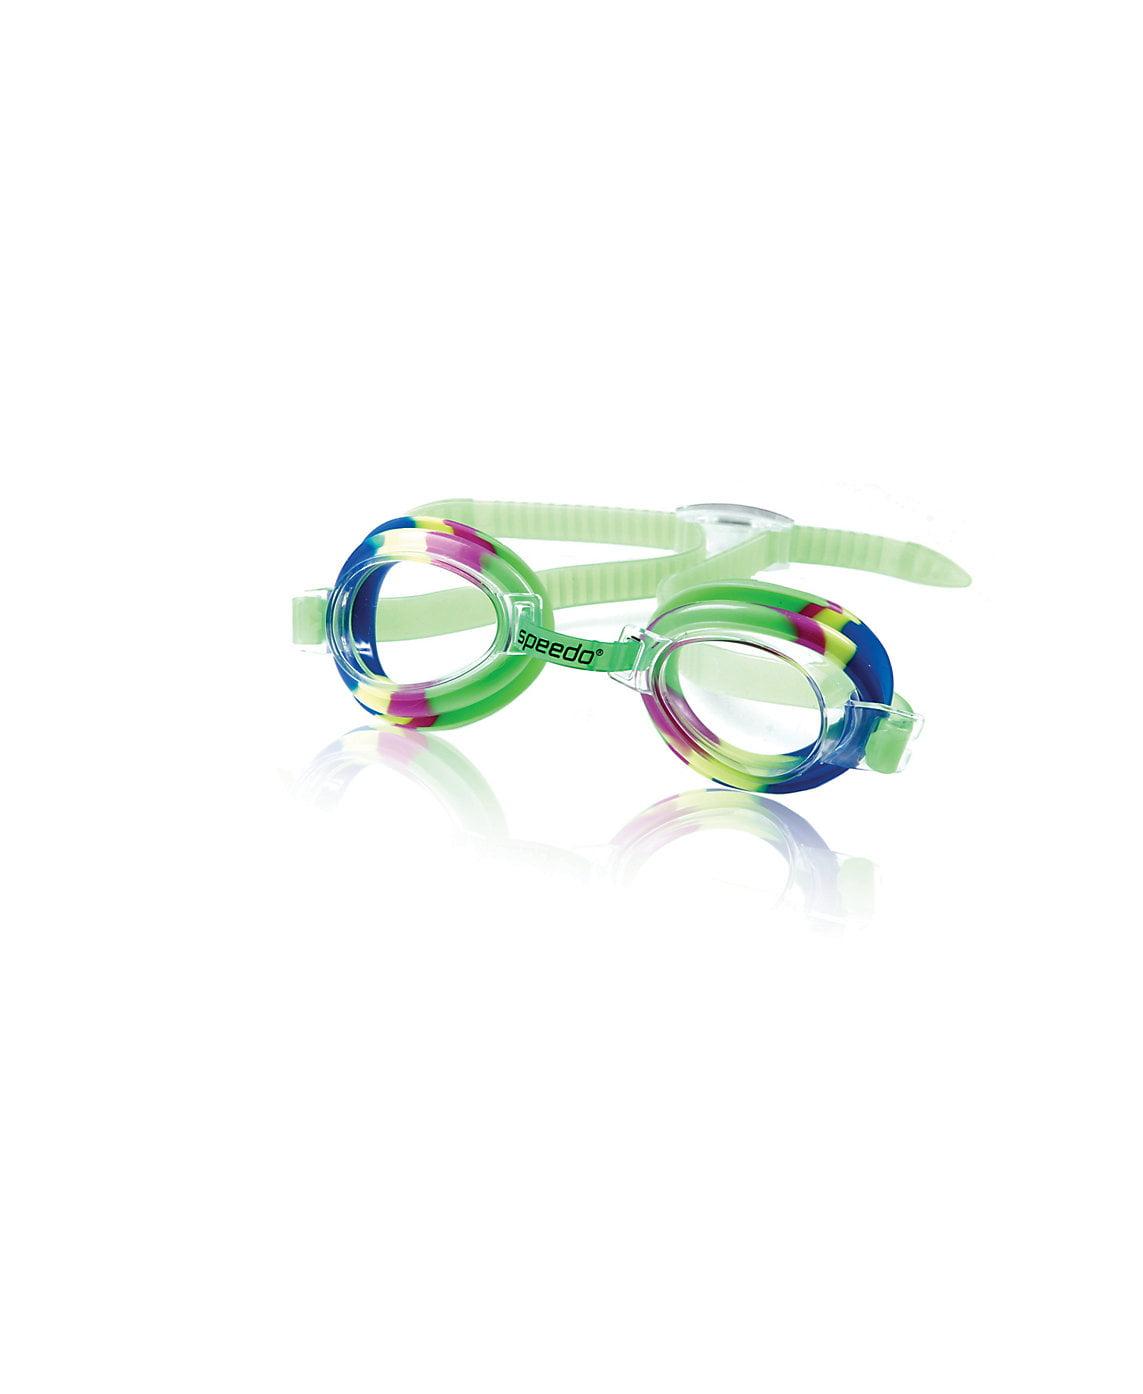 Speedo Kids Jr. Swim Swimming Tye-Dye Anti-Fog UV Protection Splasher Goggles by Speedo